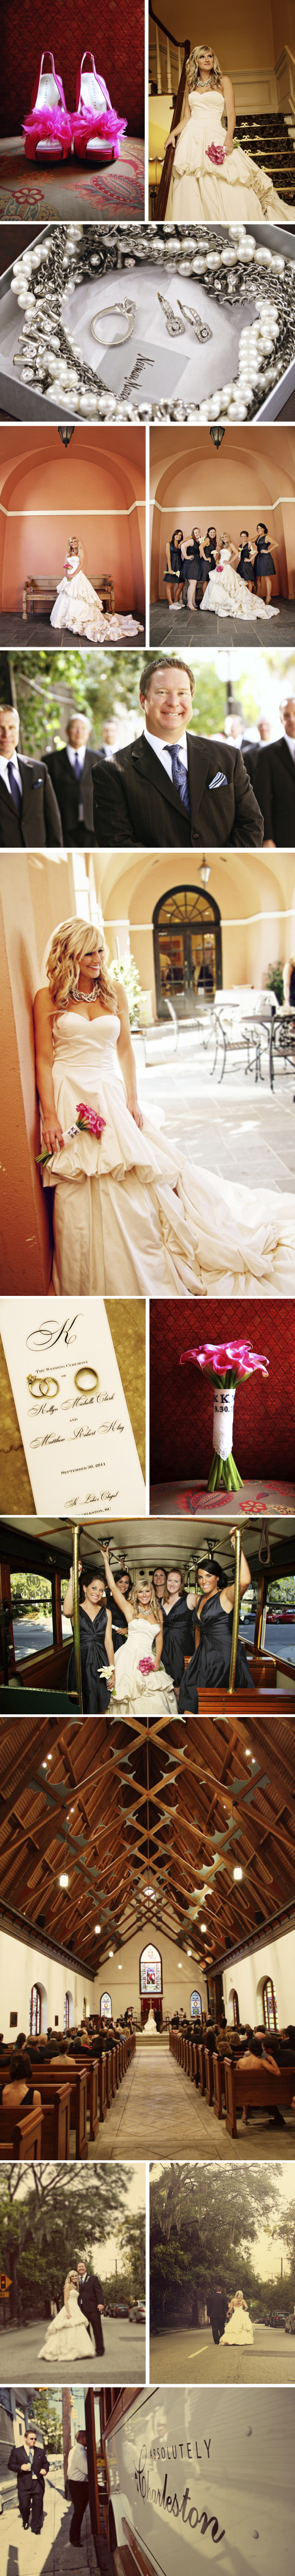 wedding pictures | wedding blogs